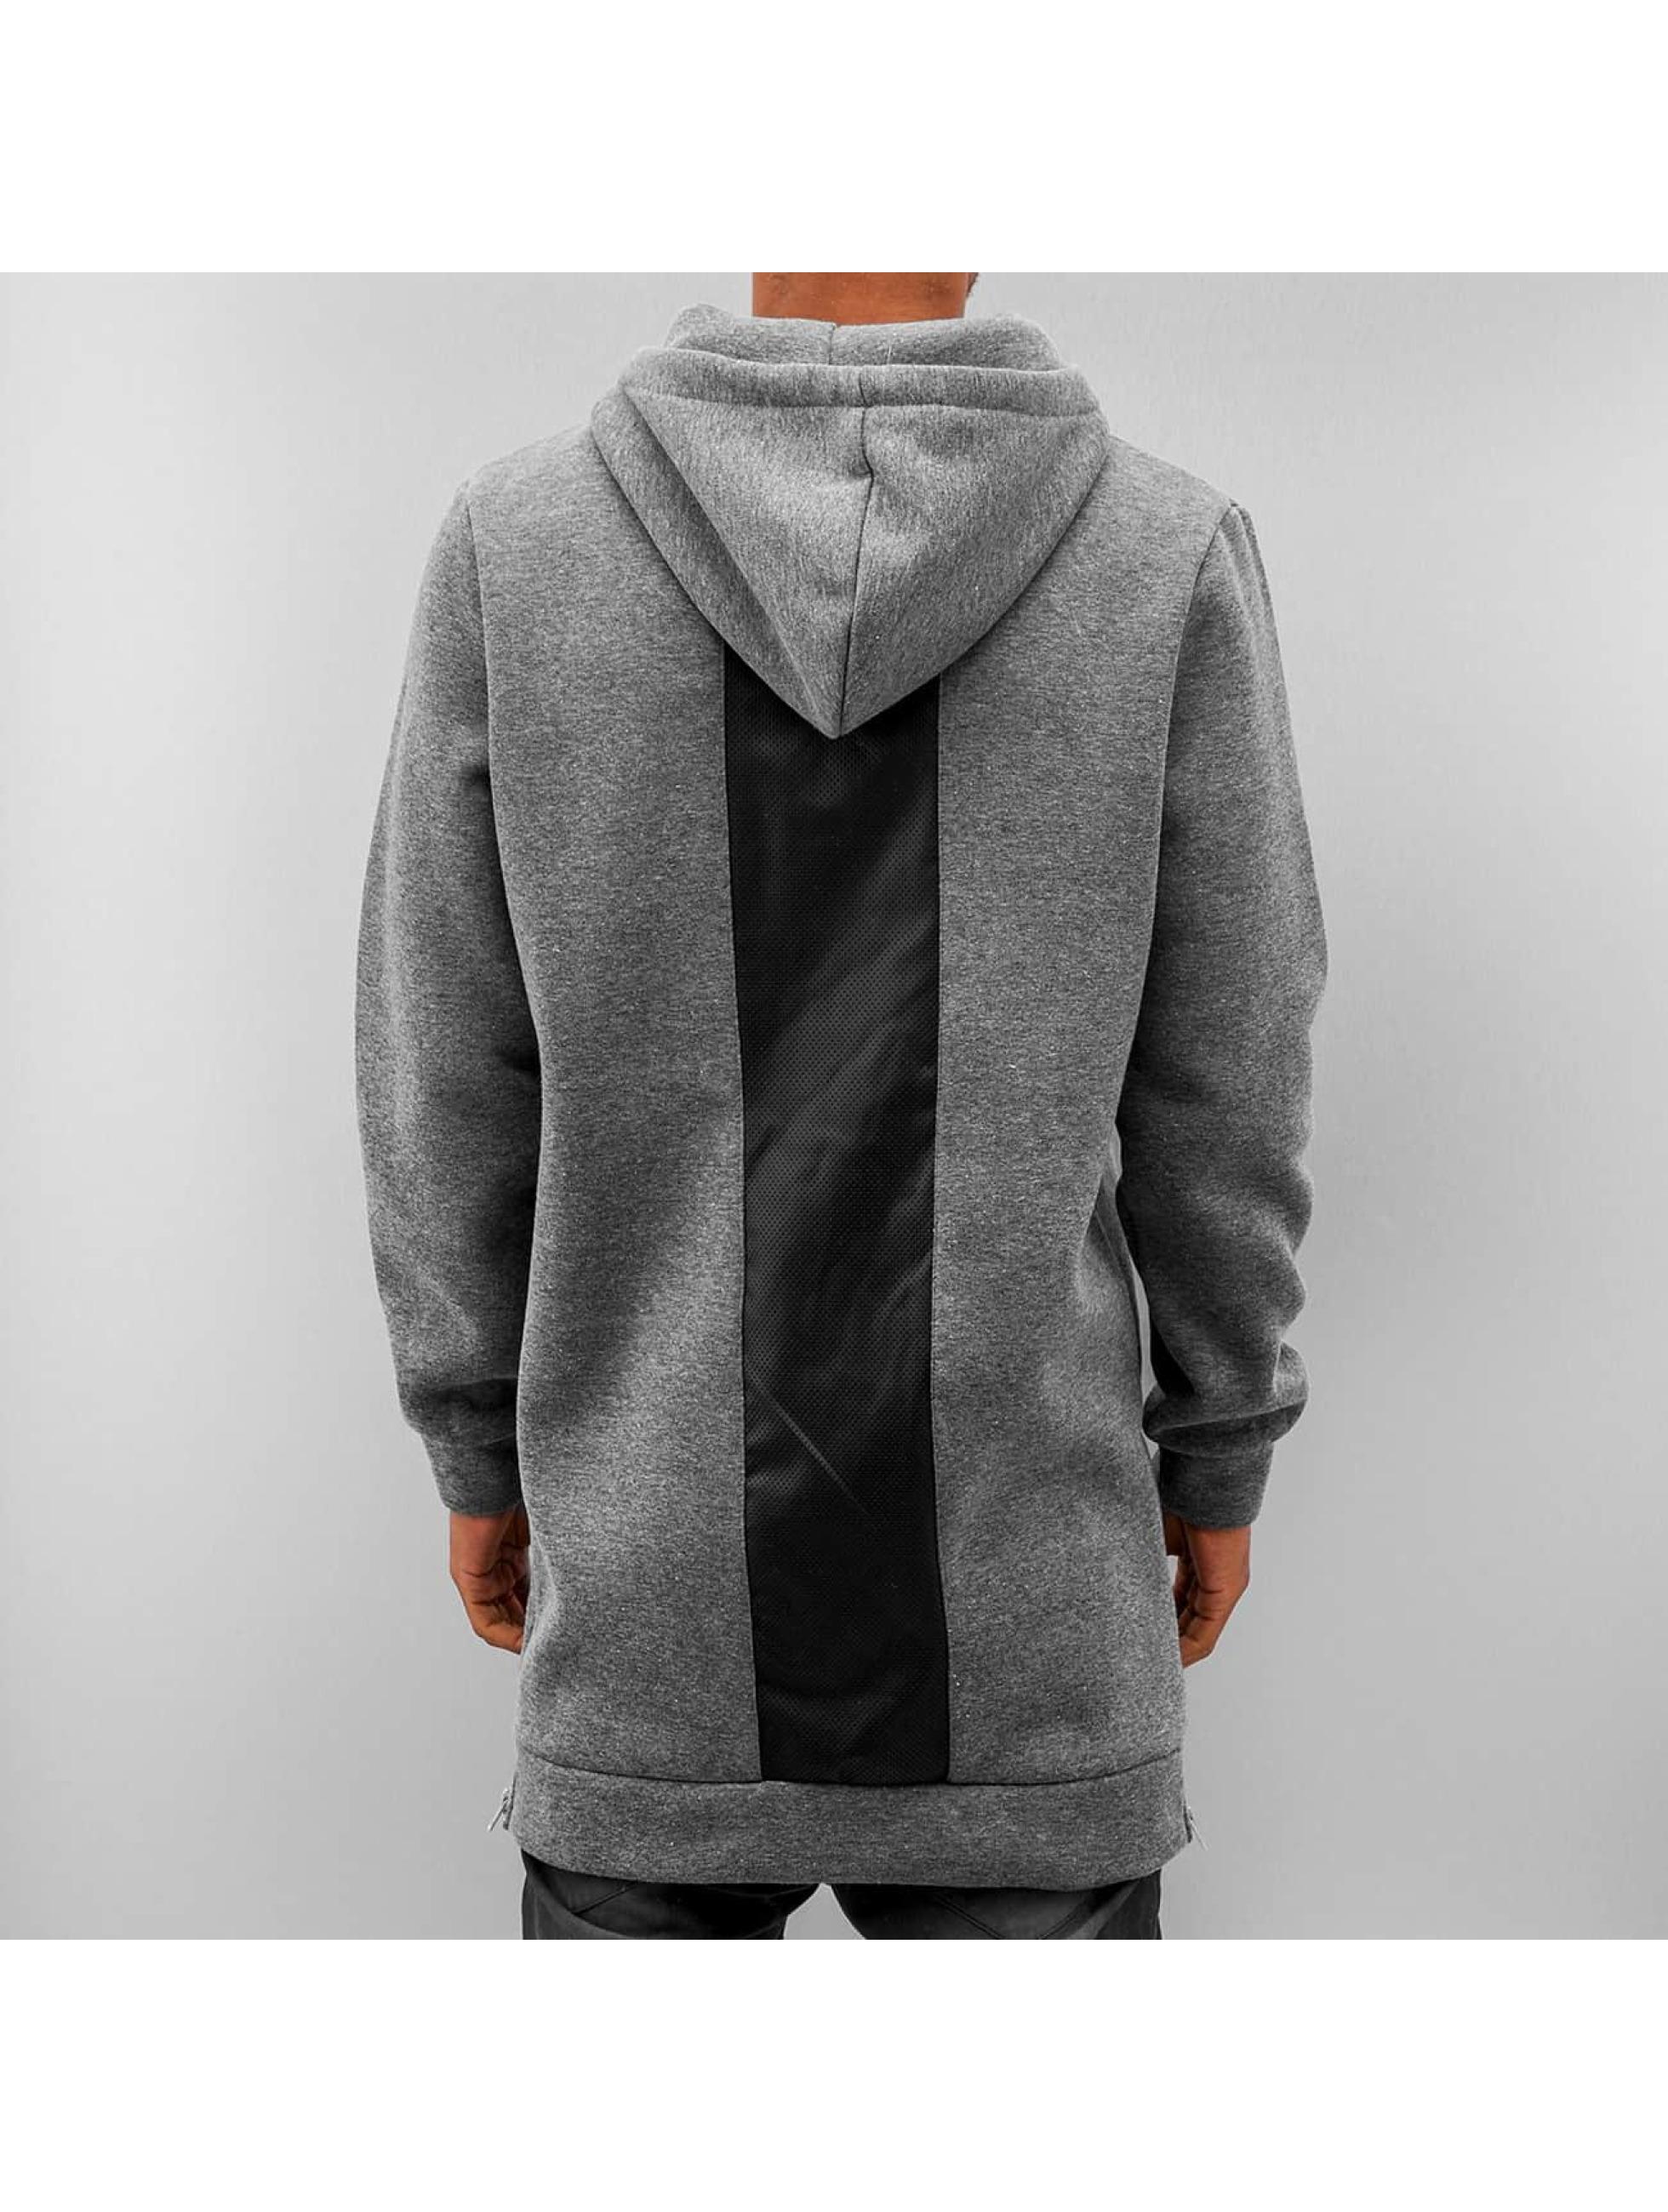 VSCT Clubwear Hoody Mesh grau